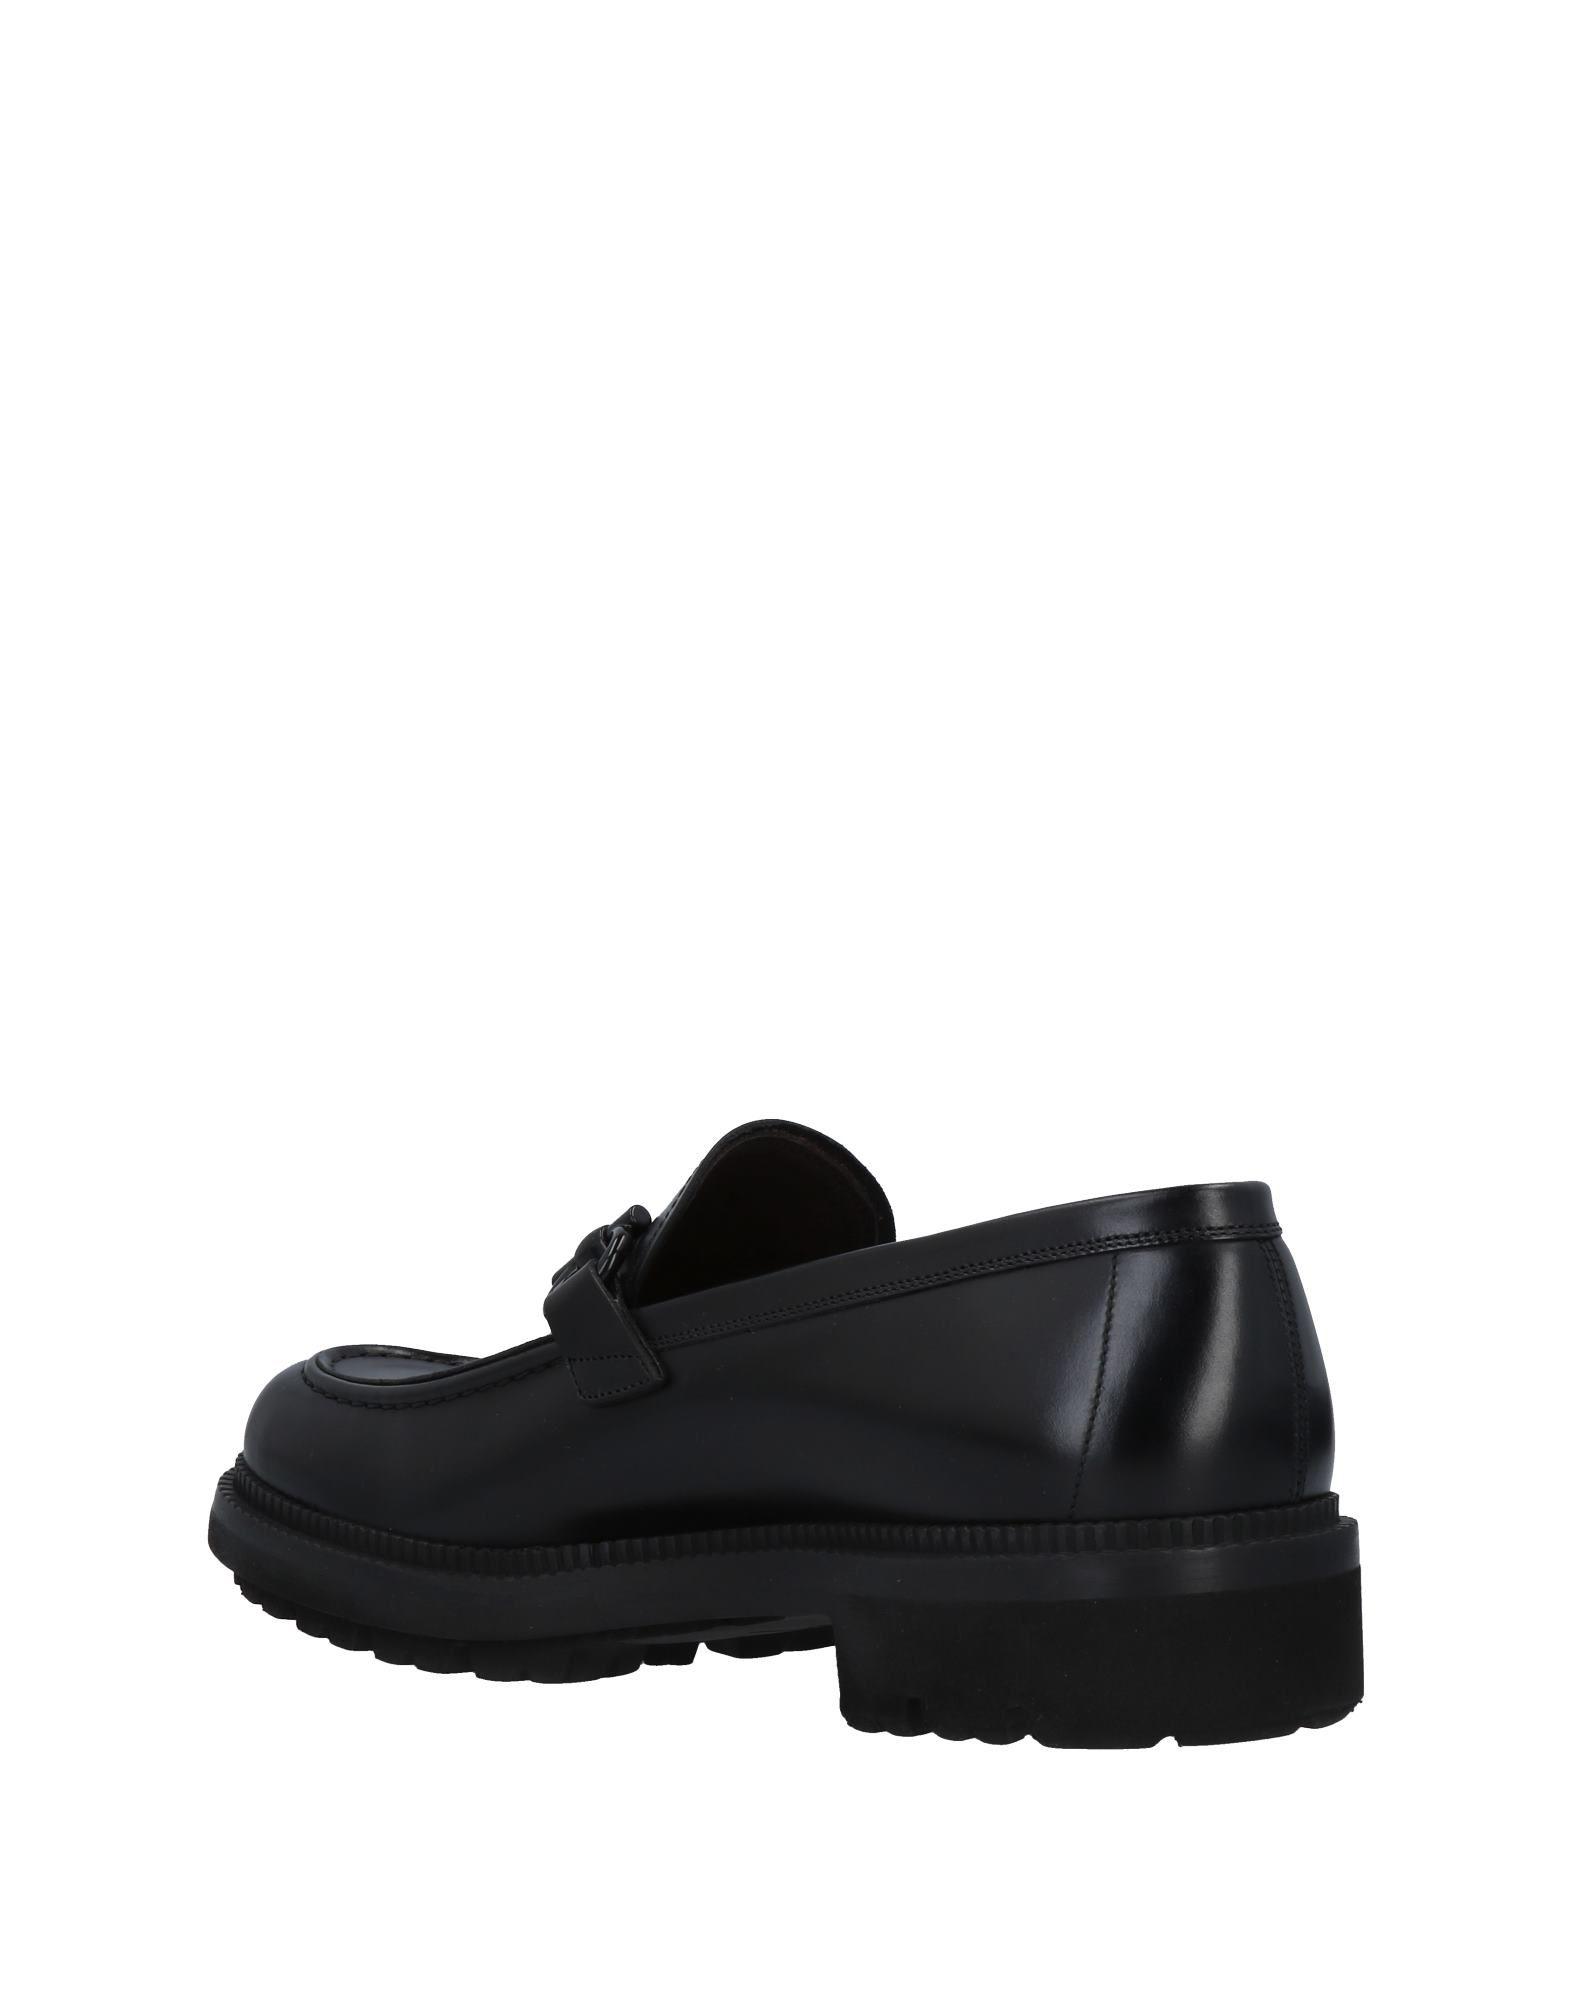 Salvatore Ferragamo Gute Mokassins Herren  11483638FS Gute Ferragamo Qualität beliebte Schuhe 115ba9